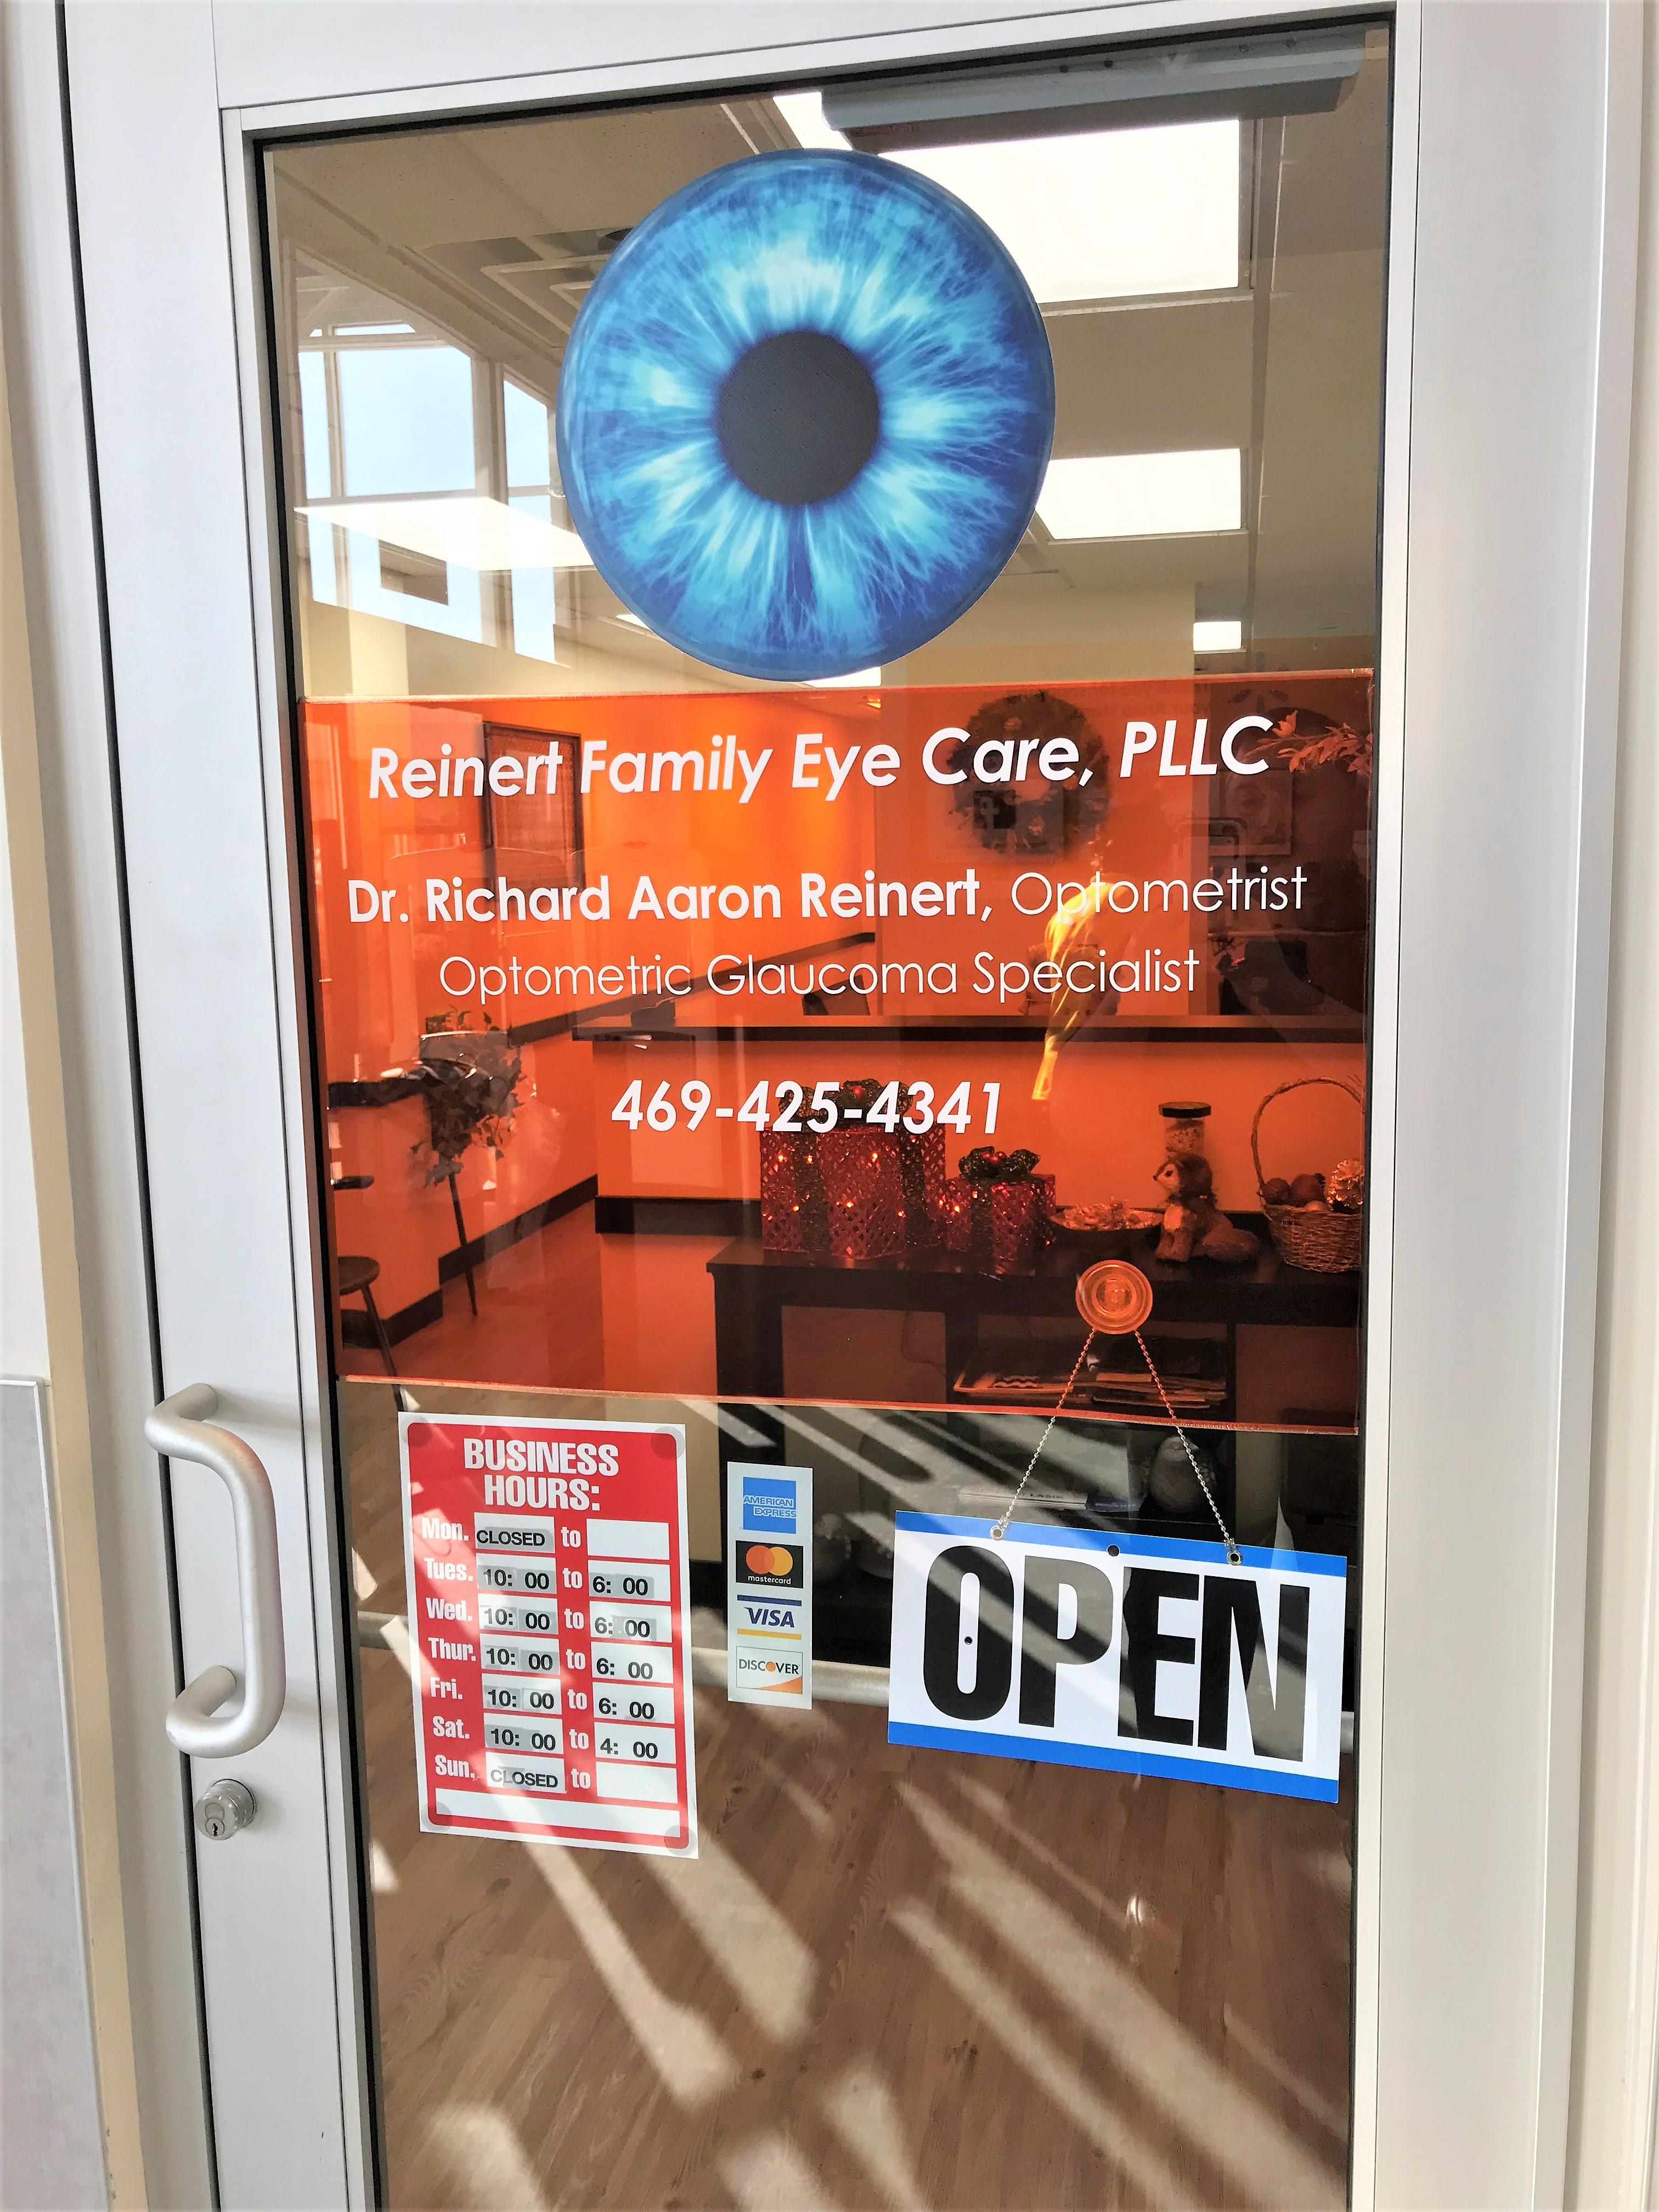 4352a96b83f Reinert Family Eye Care - Optometrist in Anna